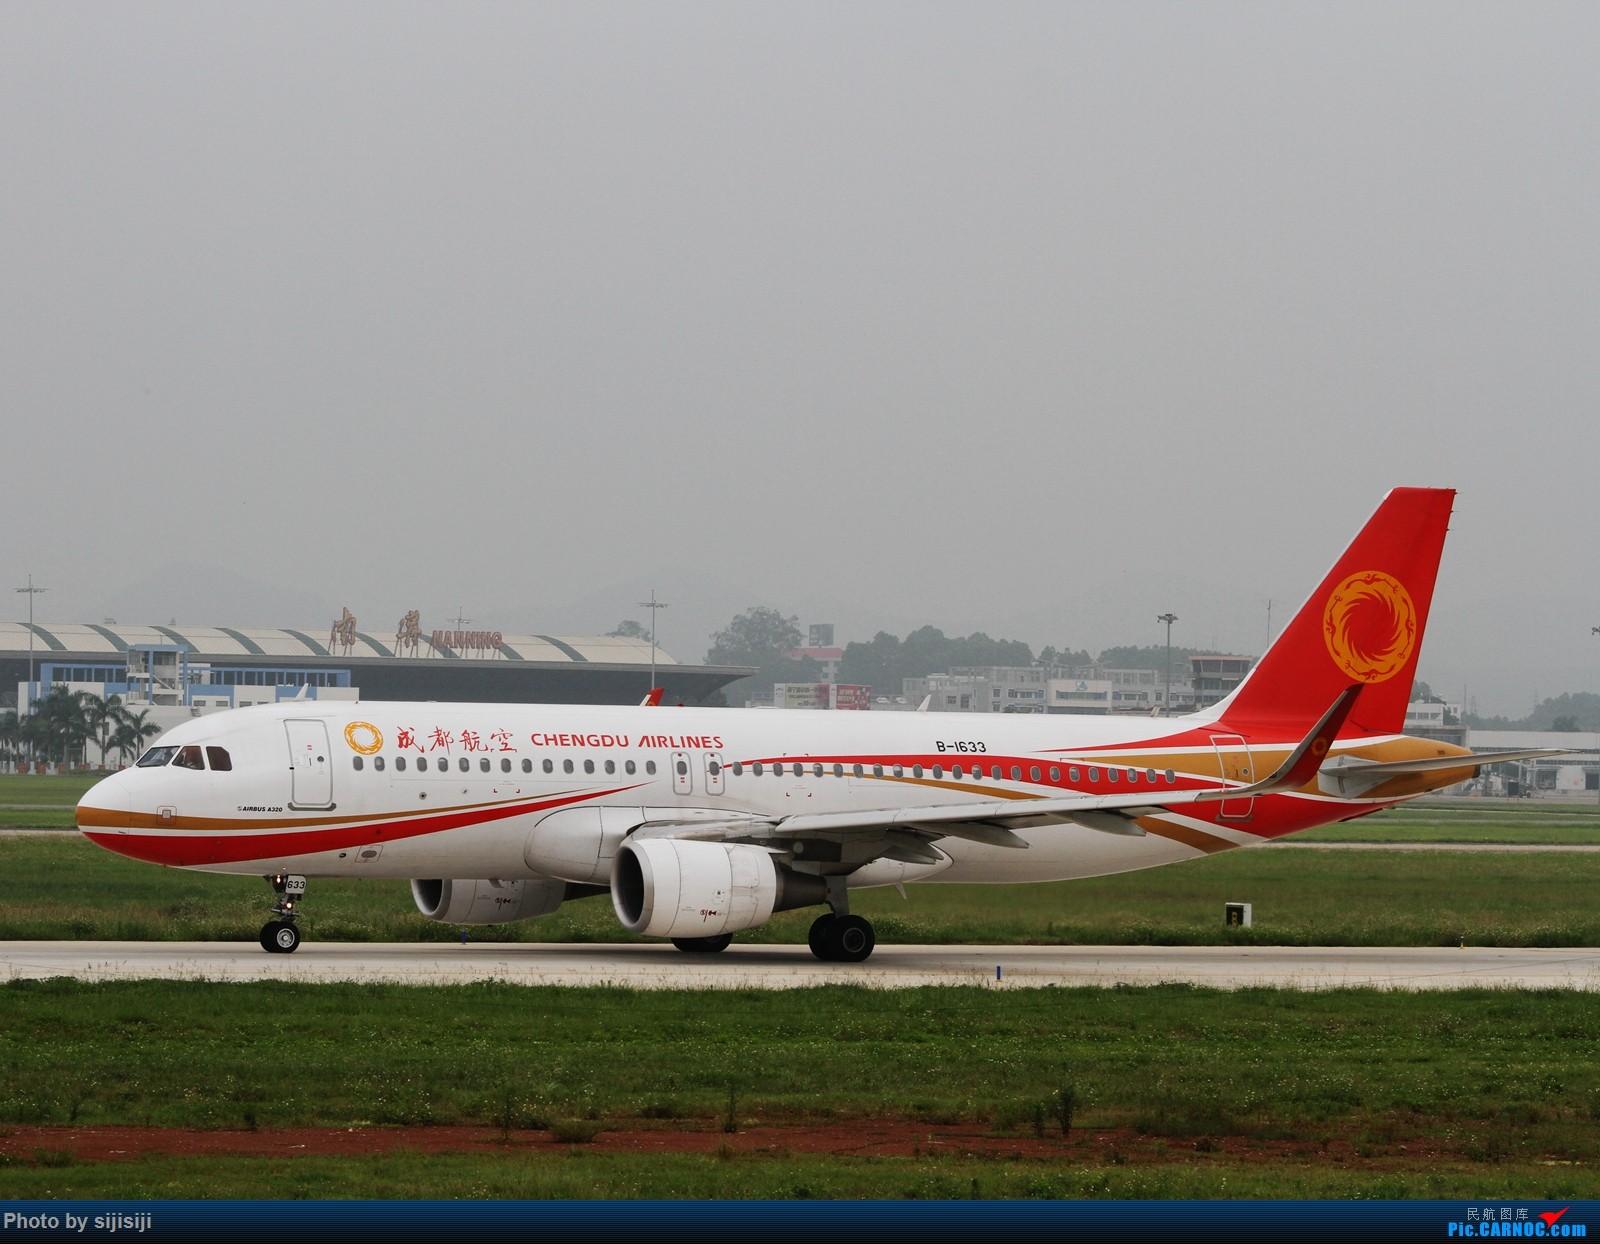 Re:[原创]【NNG飞友】屌丝村口迎来金凤凰,国航332飞抵NNG AIRBUS A320-200 B-1633 中国南宁吴圩国际机场